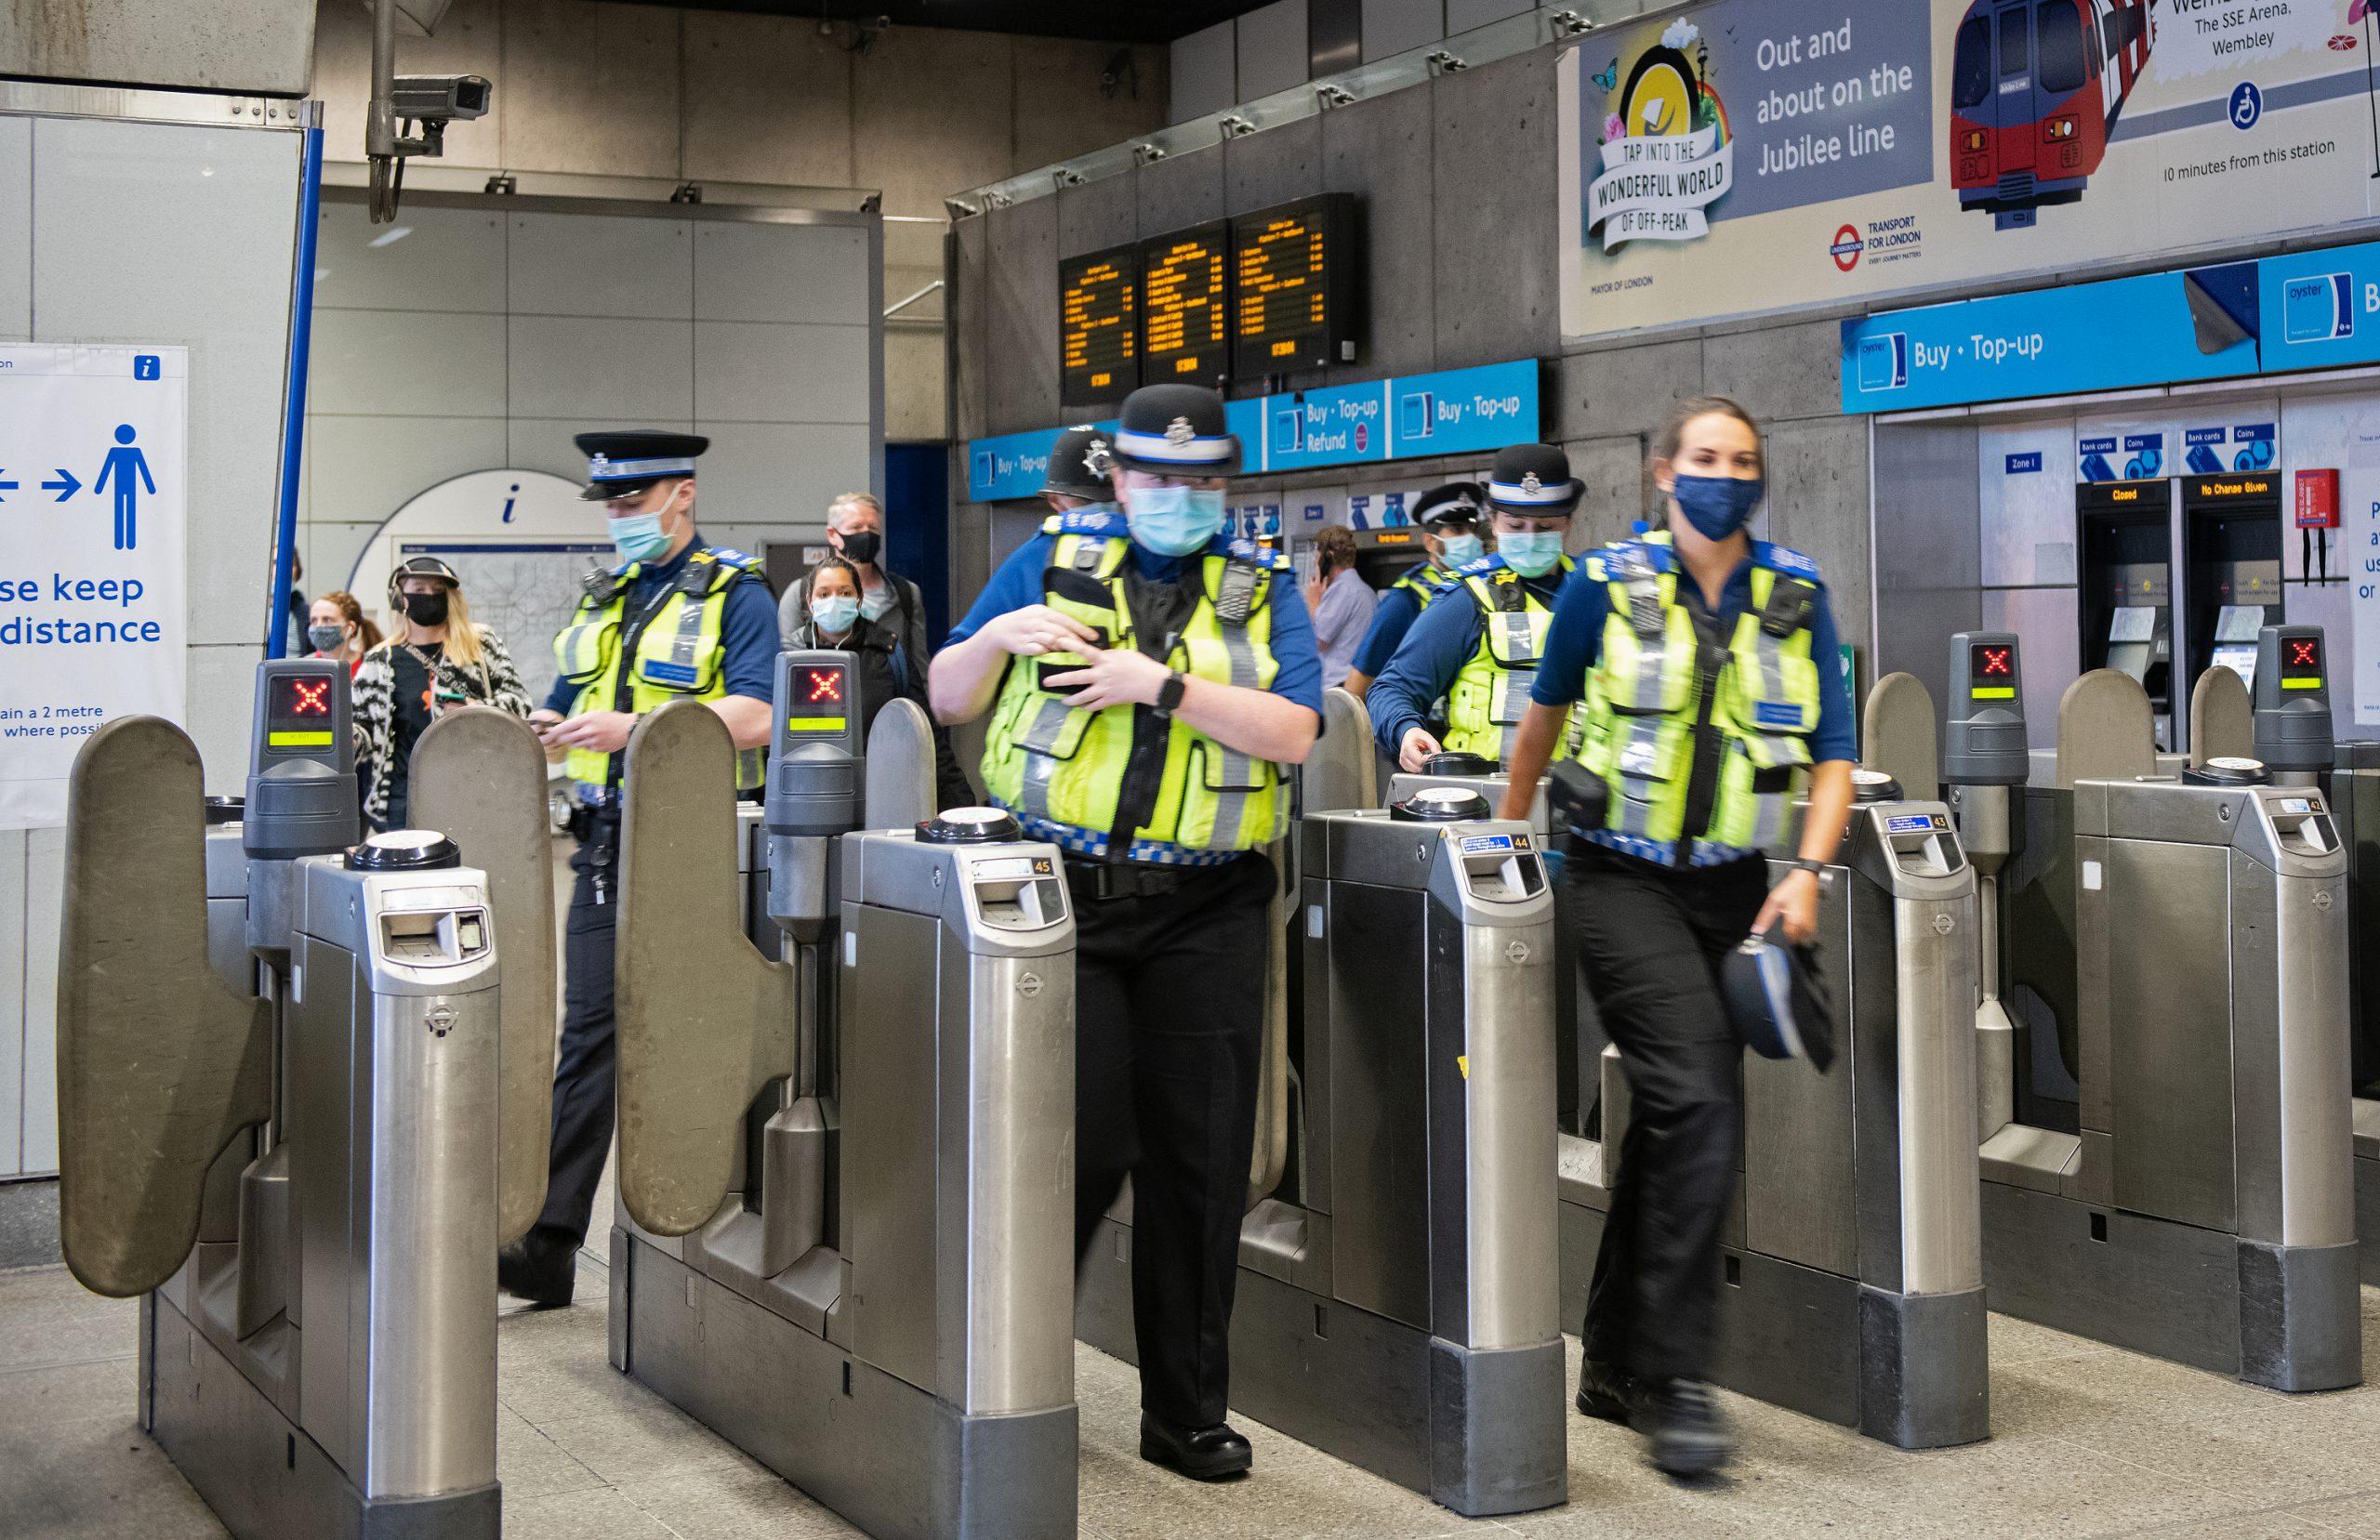 BTP face covering enforcement at Tube station